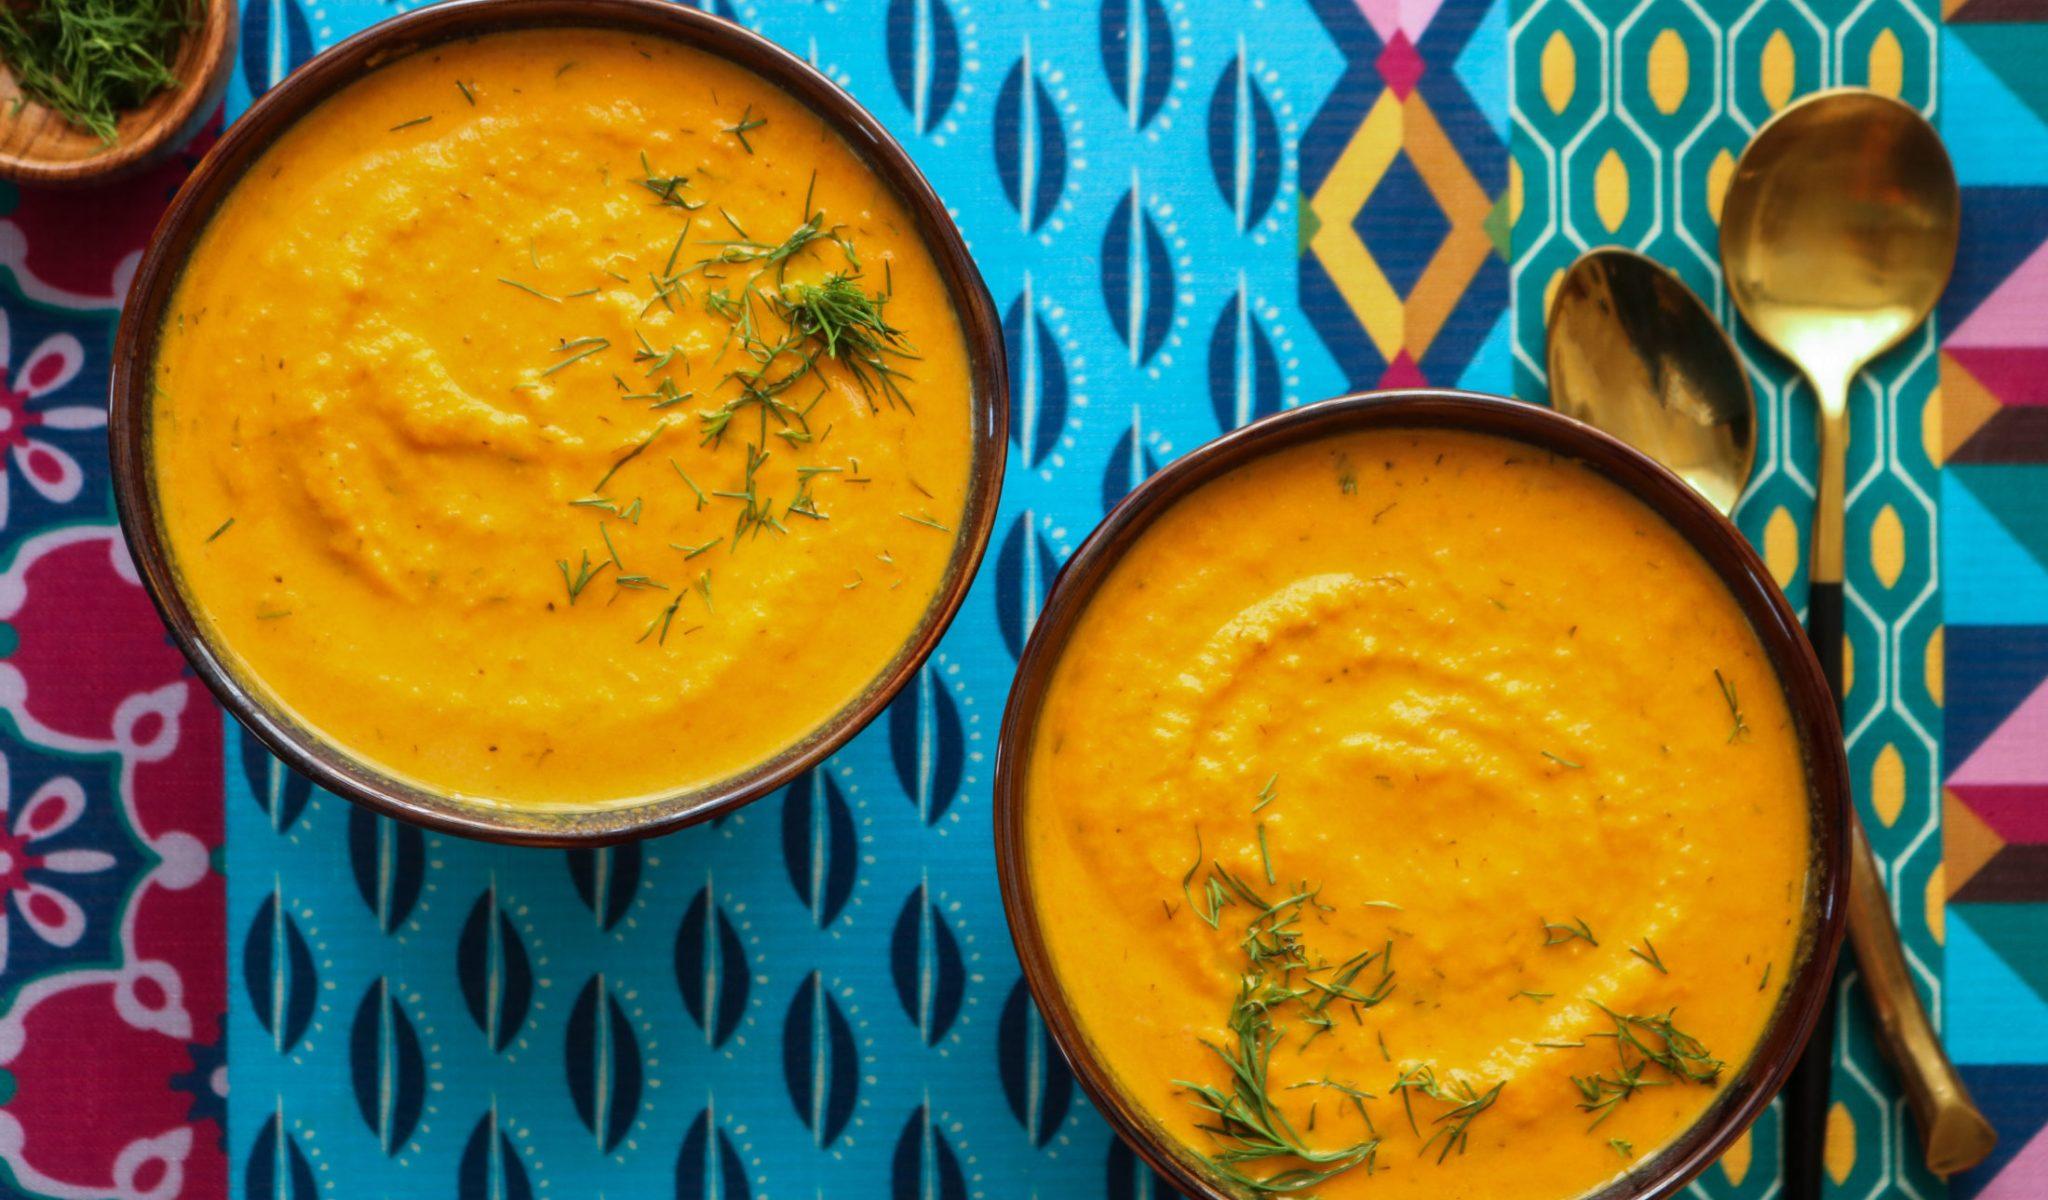 Roasted Carrot Dill Vegan Soup Recipe